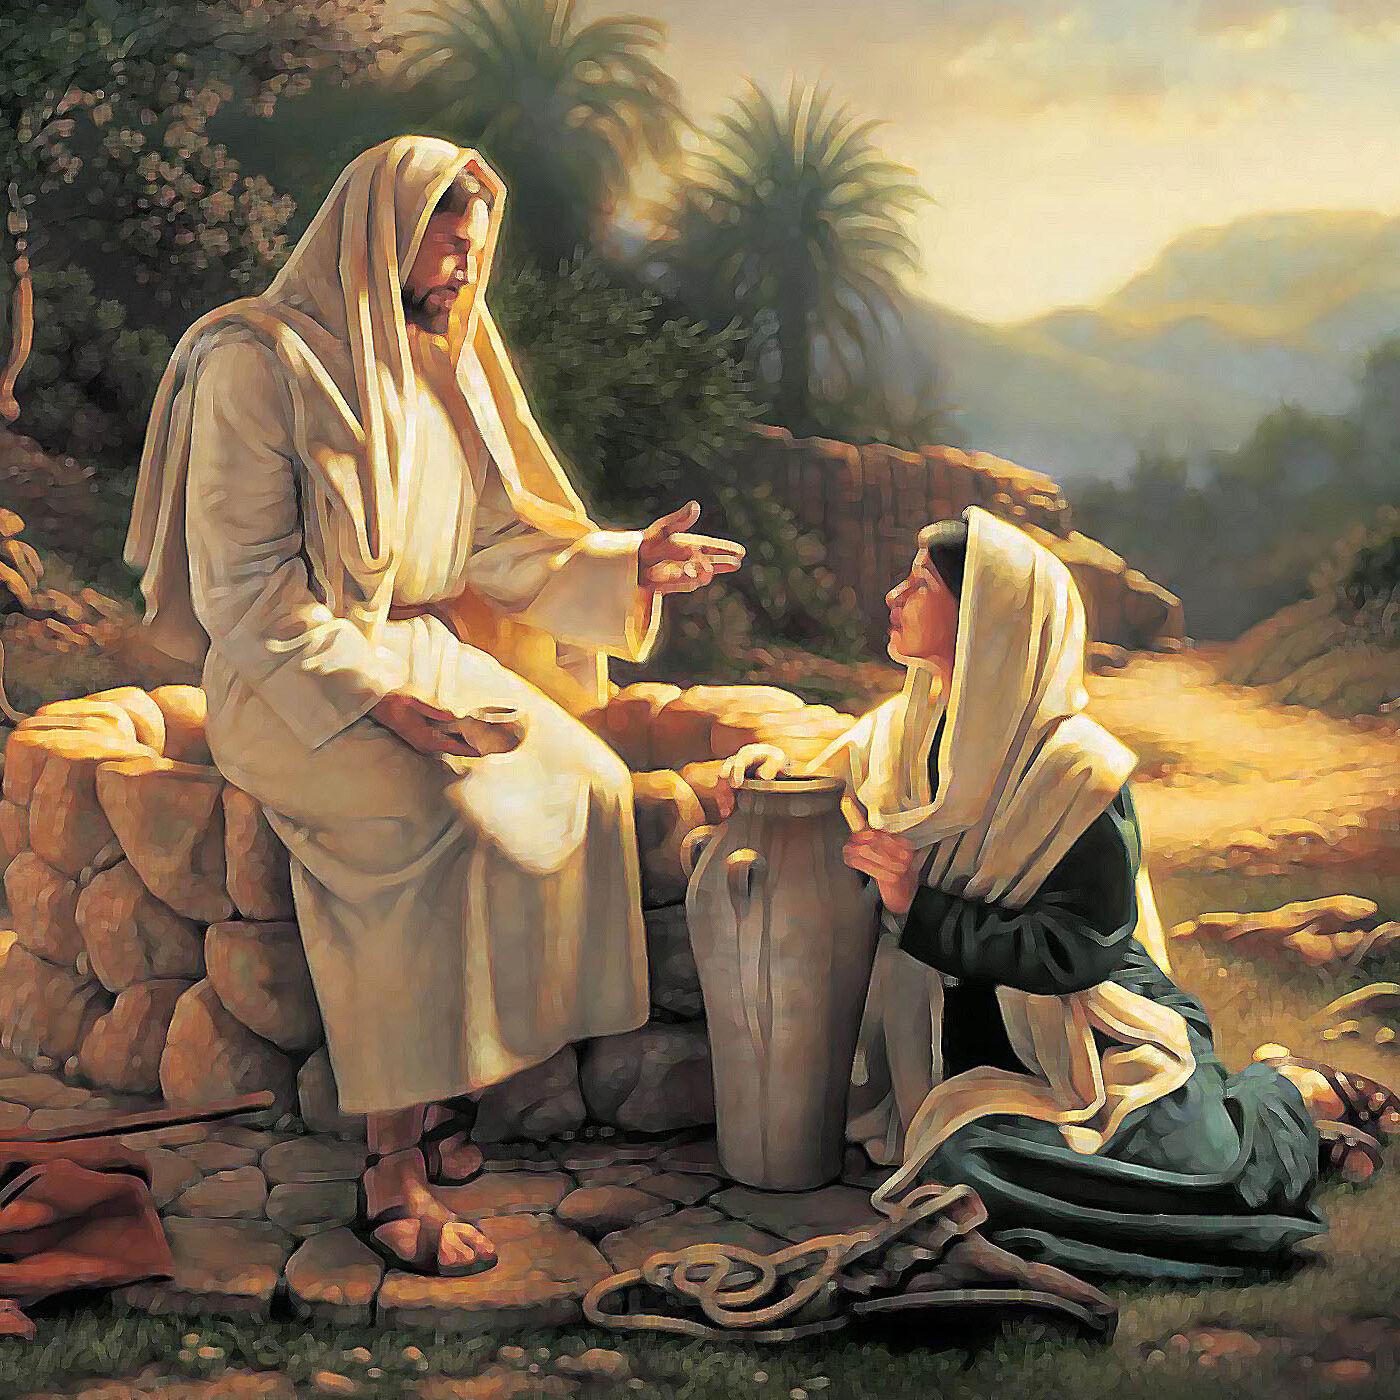 riflessioni sul Vangelo di Martedì 6 Aprile 2021 (Gv 20, 11-18) - Apostola Loredana